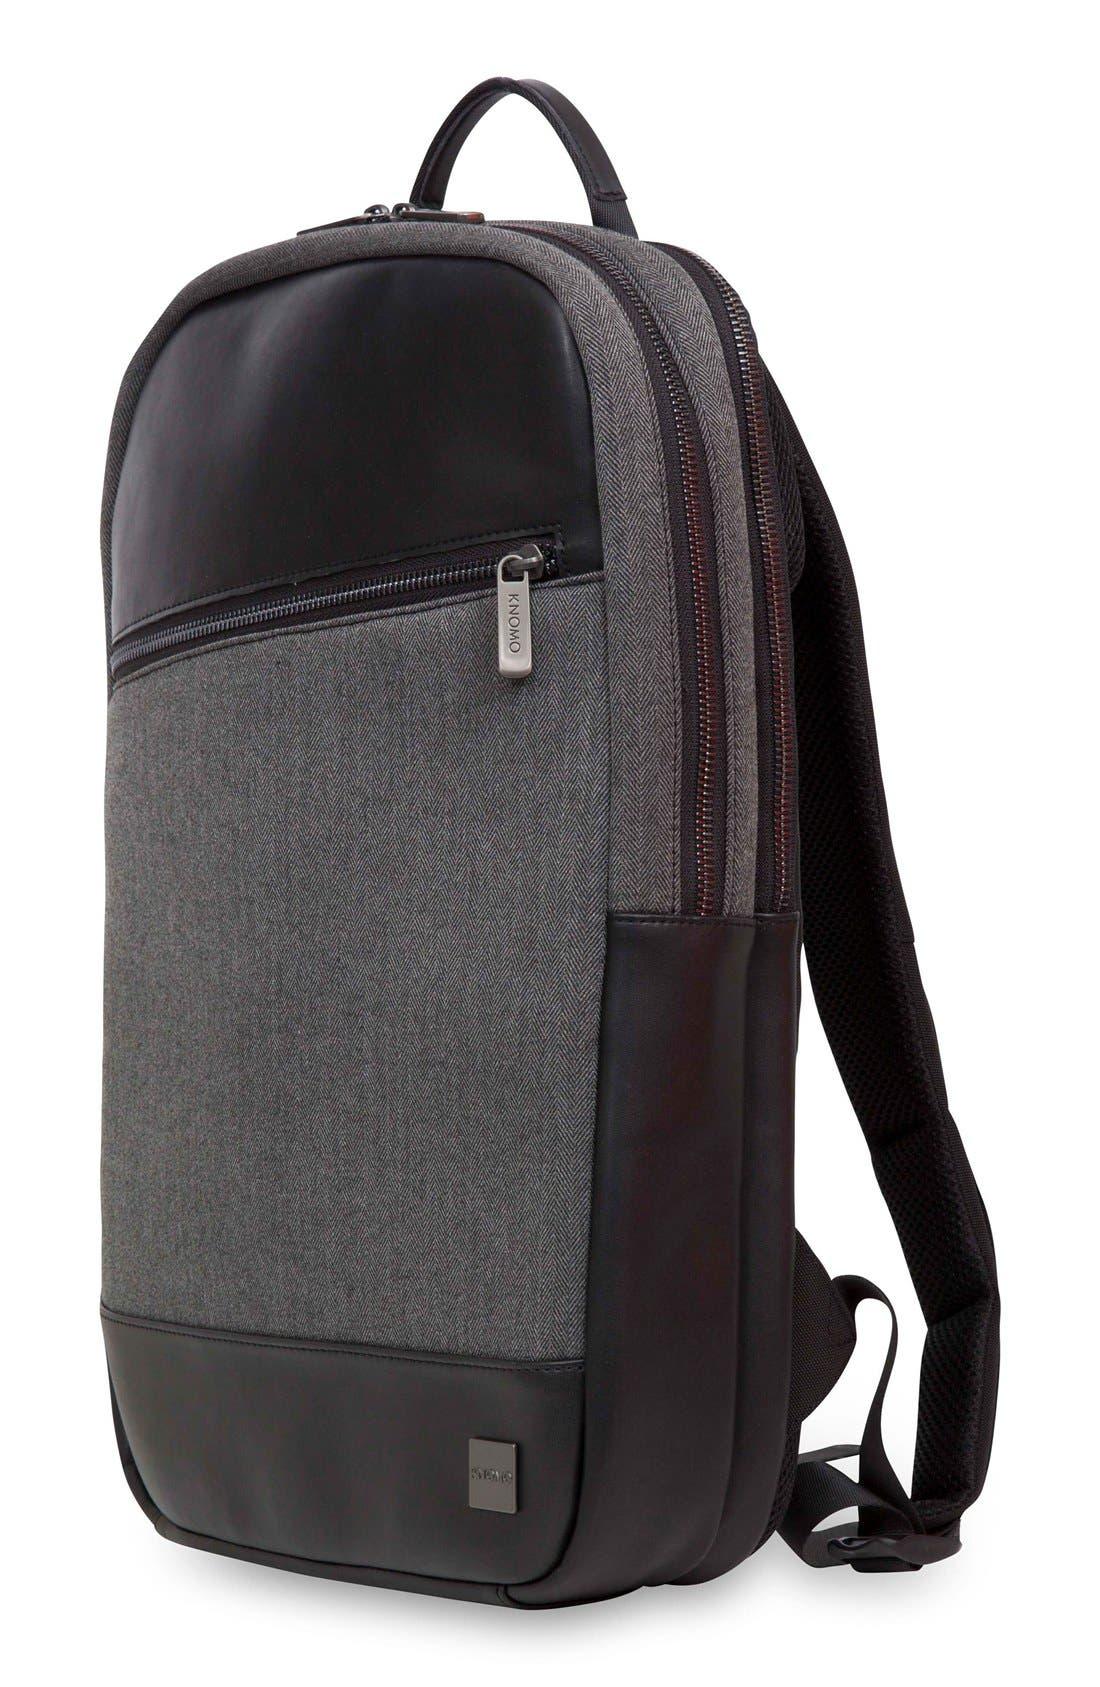 Holborn Southampton Backpack,                             Alternate thumbnail 4, color,                             Grey